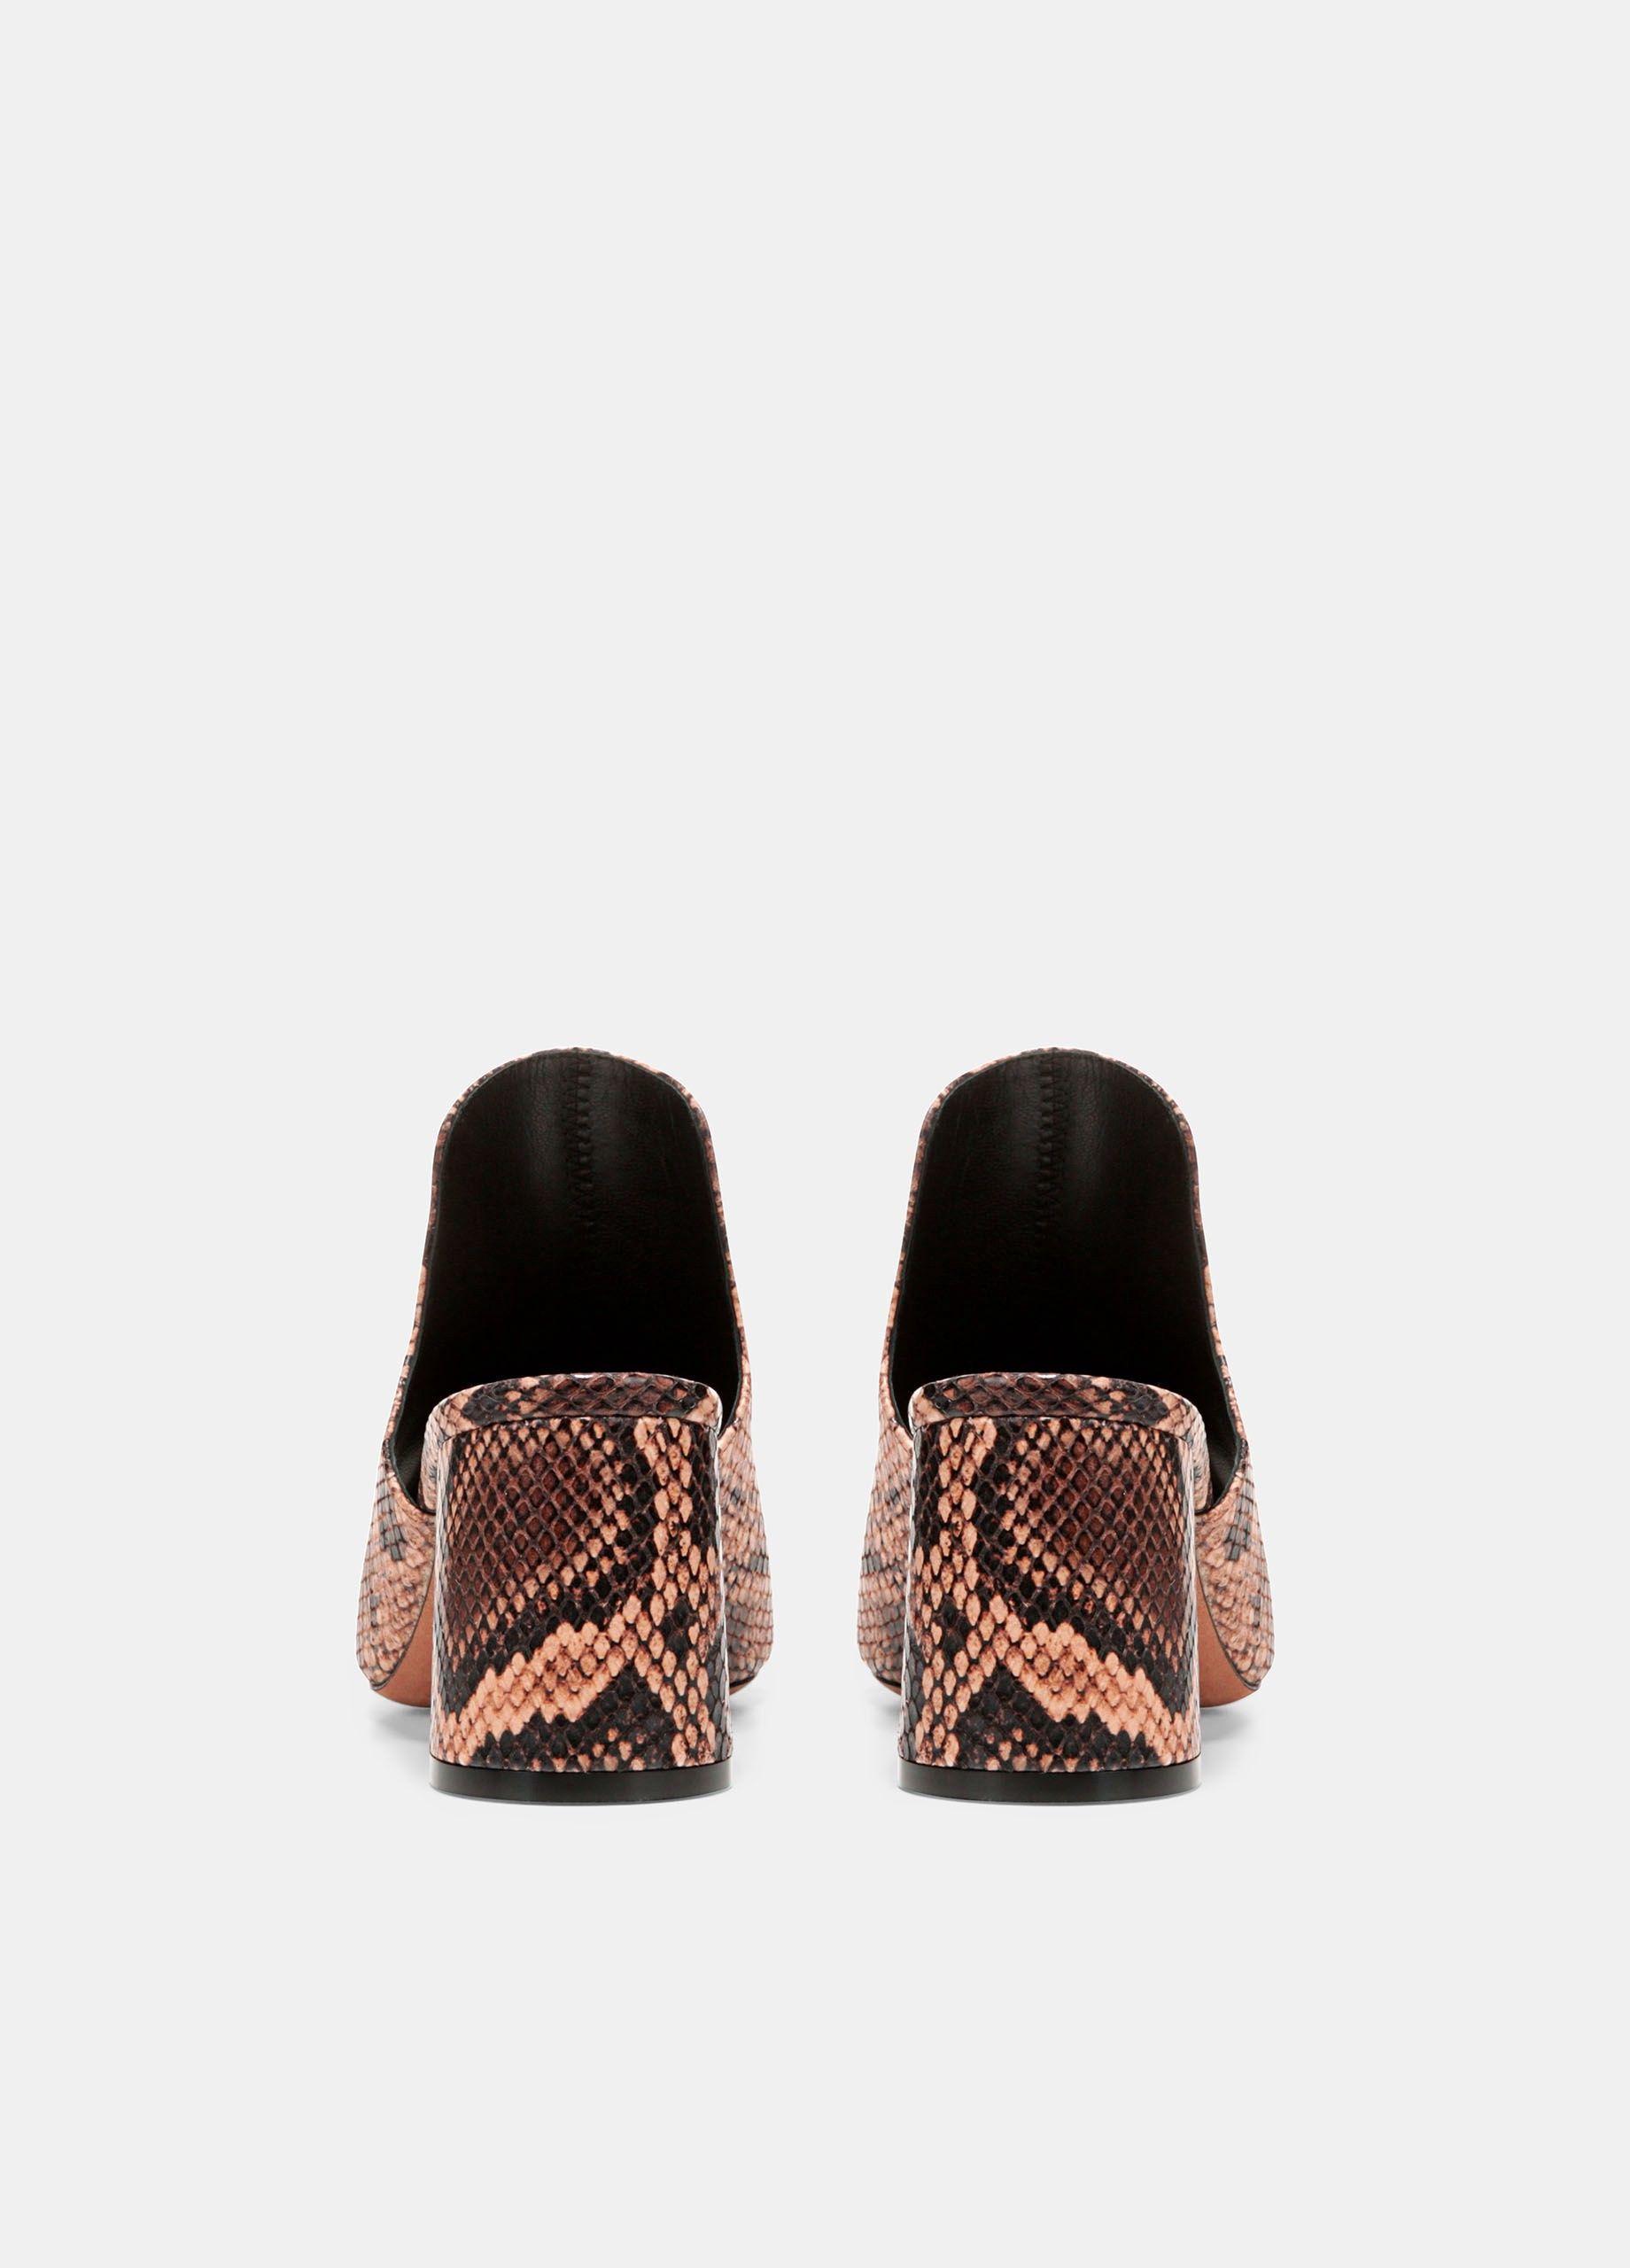 88a7d0d4ae4 Vince Tanay Snake-Print Leather Slides - Senegal 9.5